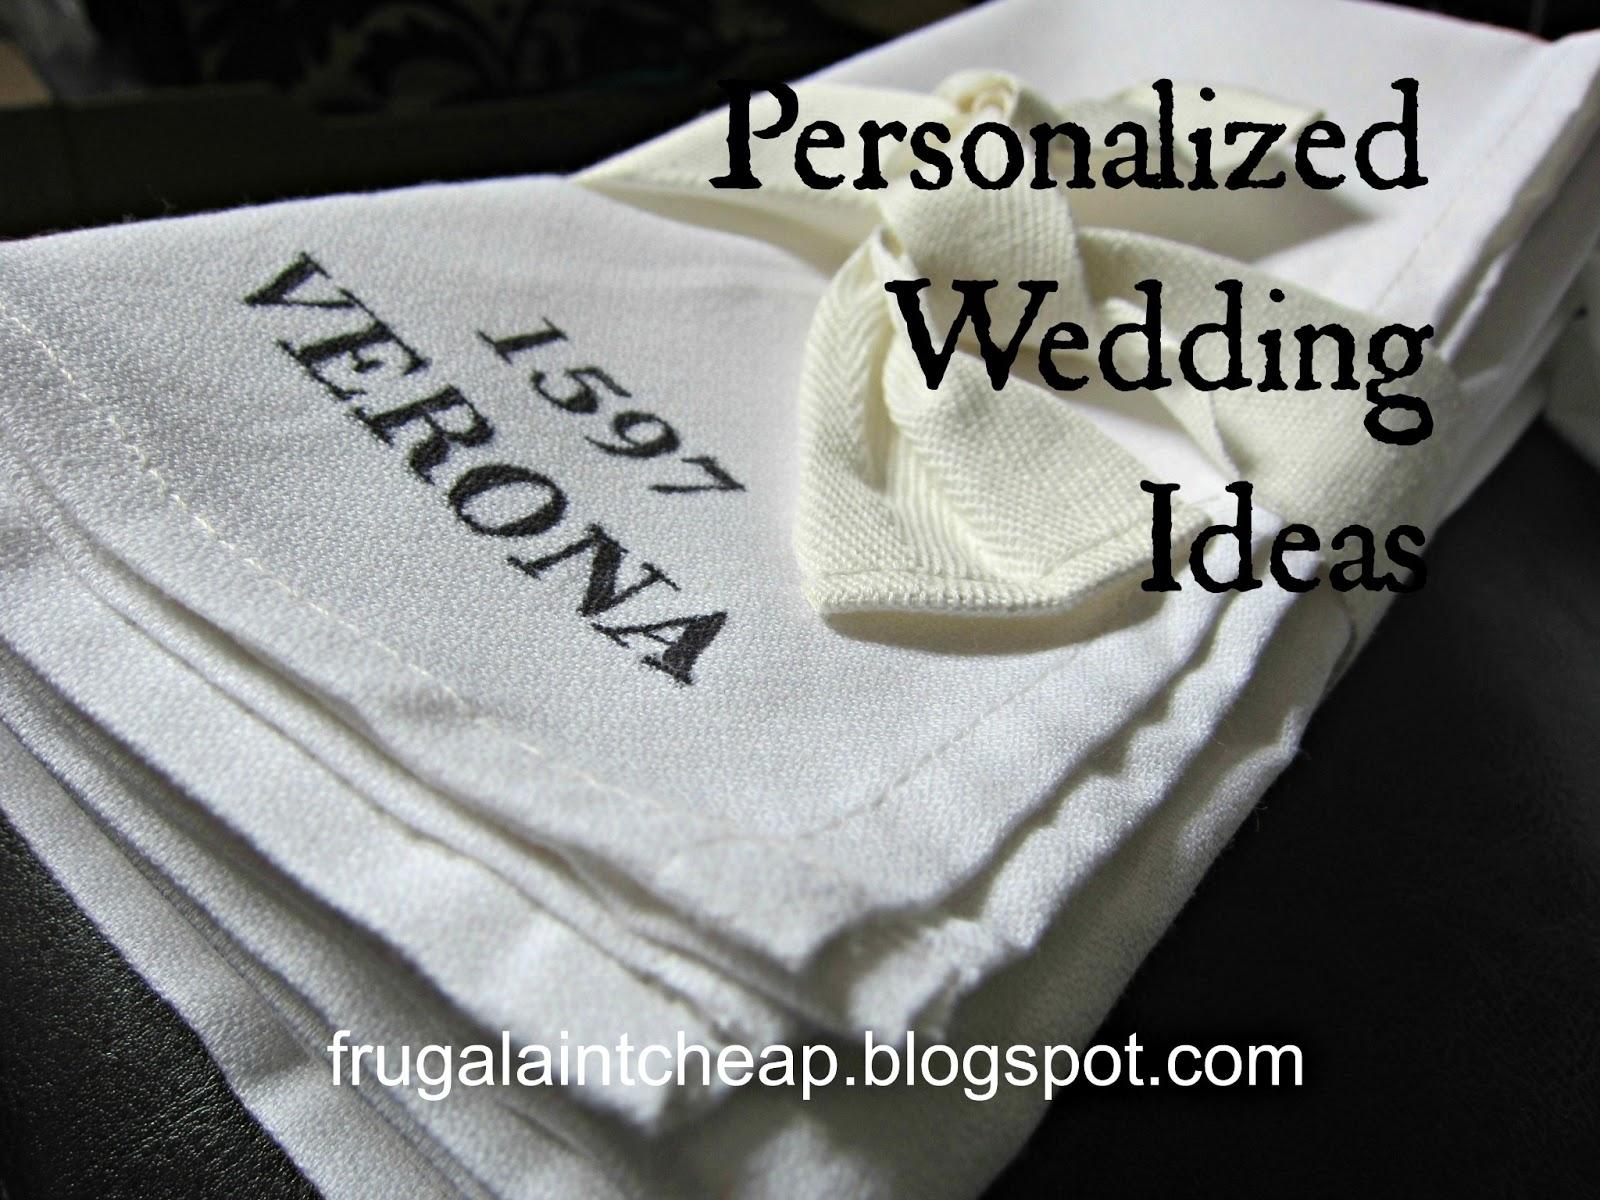 Cheap Wedding Gifts Ideas: Frugal Ain't Cheap: Wedding Gifts Ideas